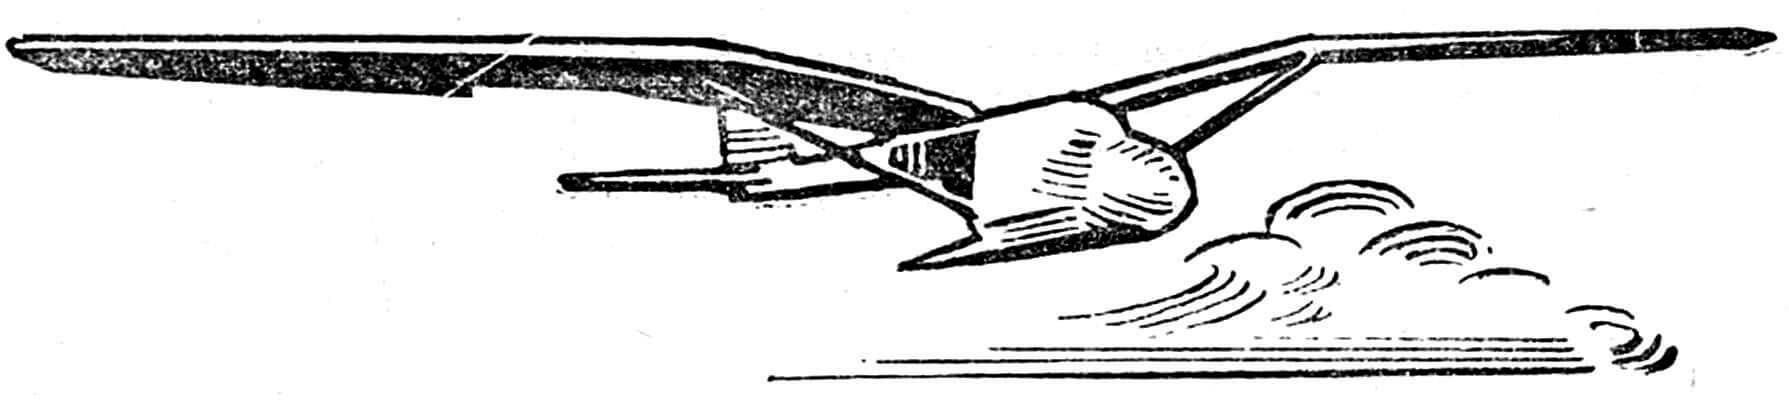 Рис. 5. Планер-орнитоптер американца Моола.